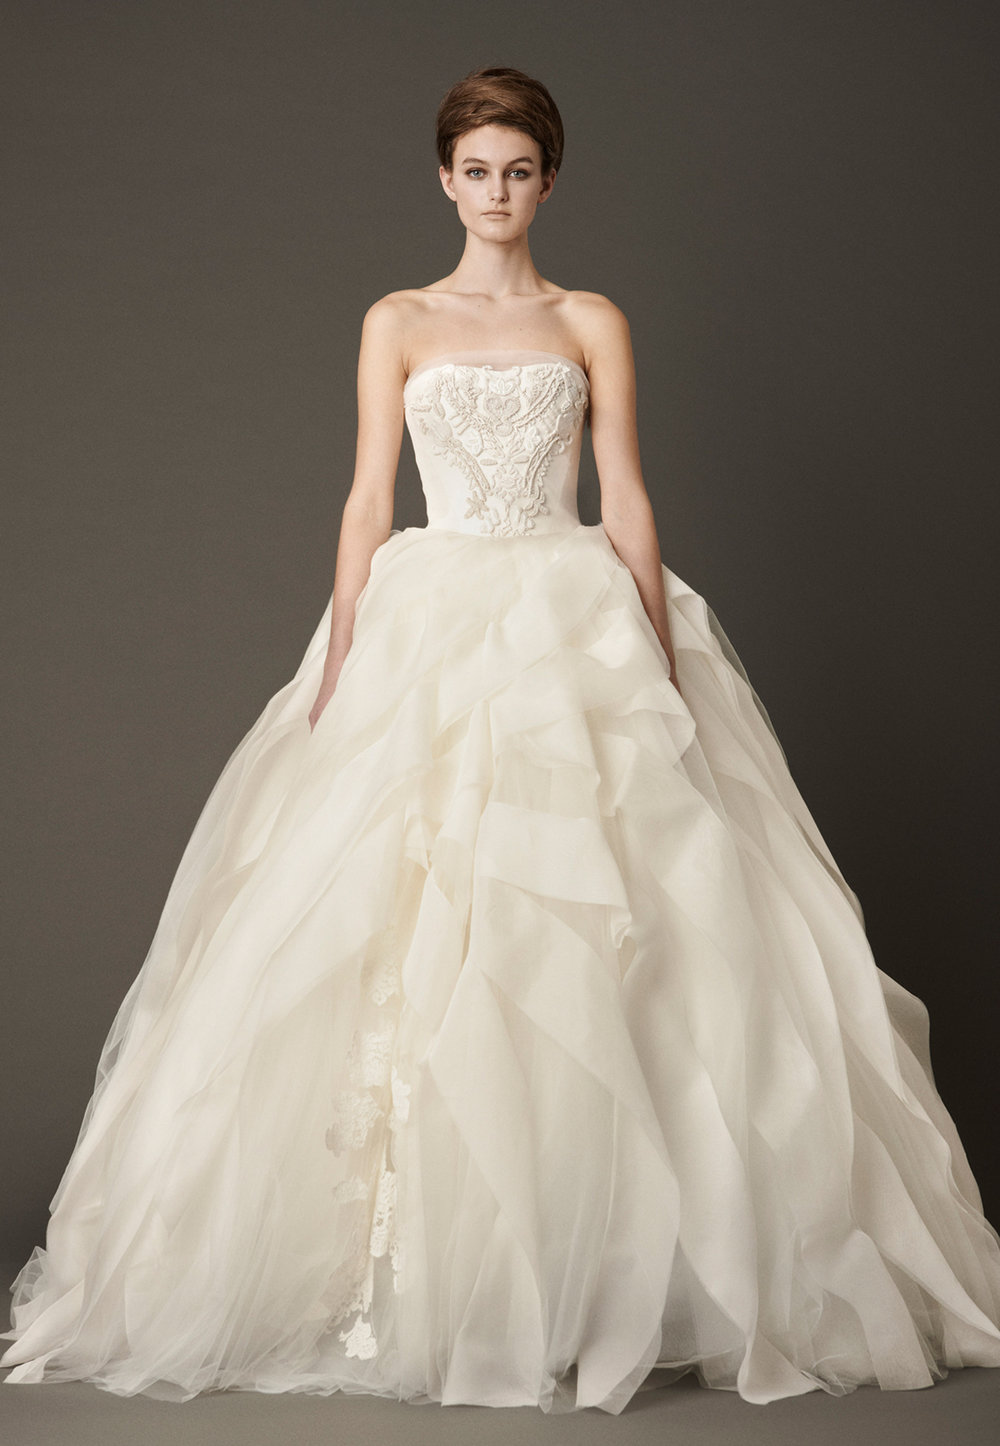 Iconic Style    Gown Name: Liesel 桃心形領口公主大裙婚紗    Description: 桃心形領口公主大裙婚紗,上身綴以手工刺繡細節,下擺不但有蕾絲貼花為 特色細節,更飾有似是一條條絲帶隨意組合的絲綢透明紗。這是一襲集傳統、時尚與夢幻 於一身的婚紗,又如海浪般起伏的裙擺,自然地形成不對稱效果,如夢幻舞會的禮服。